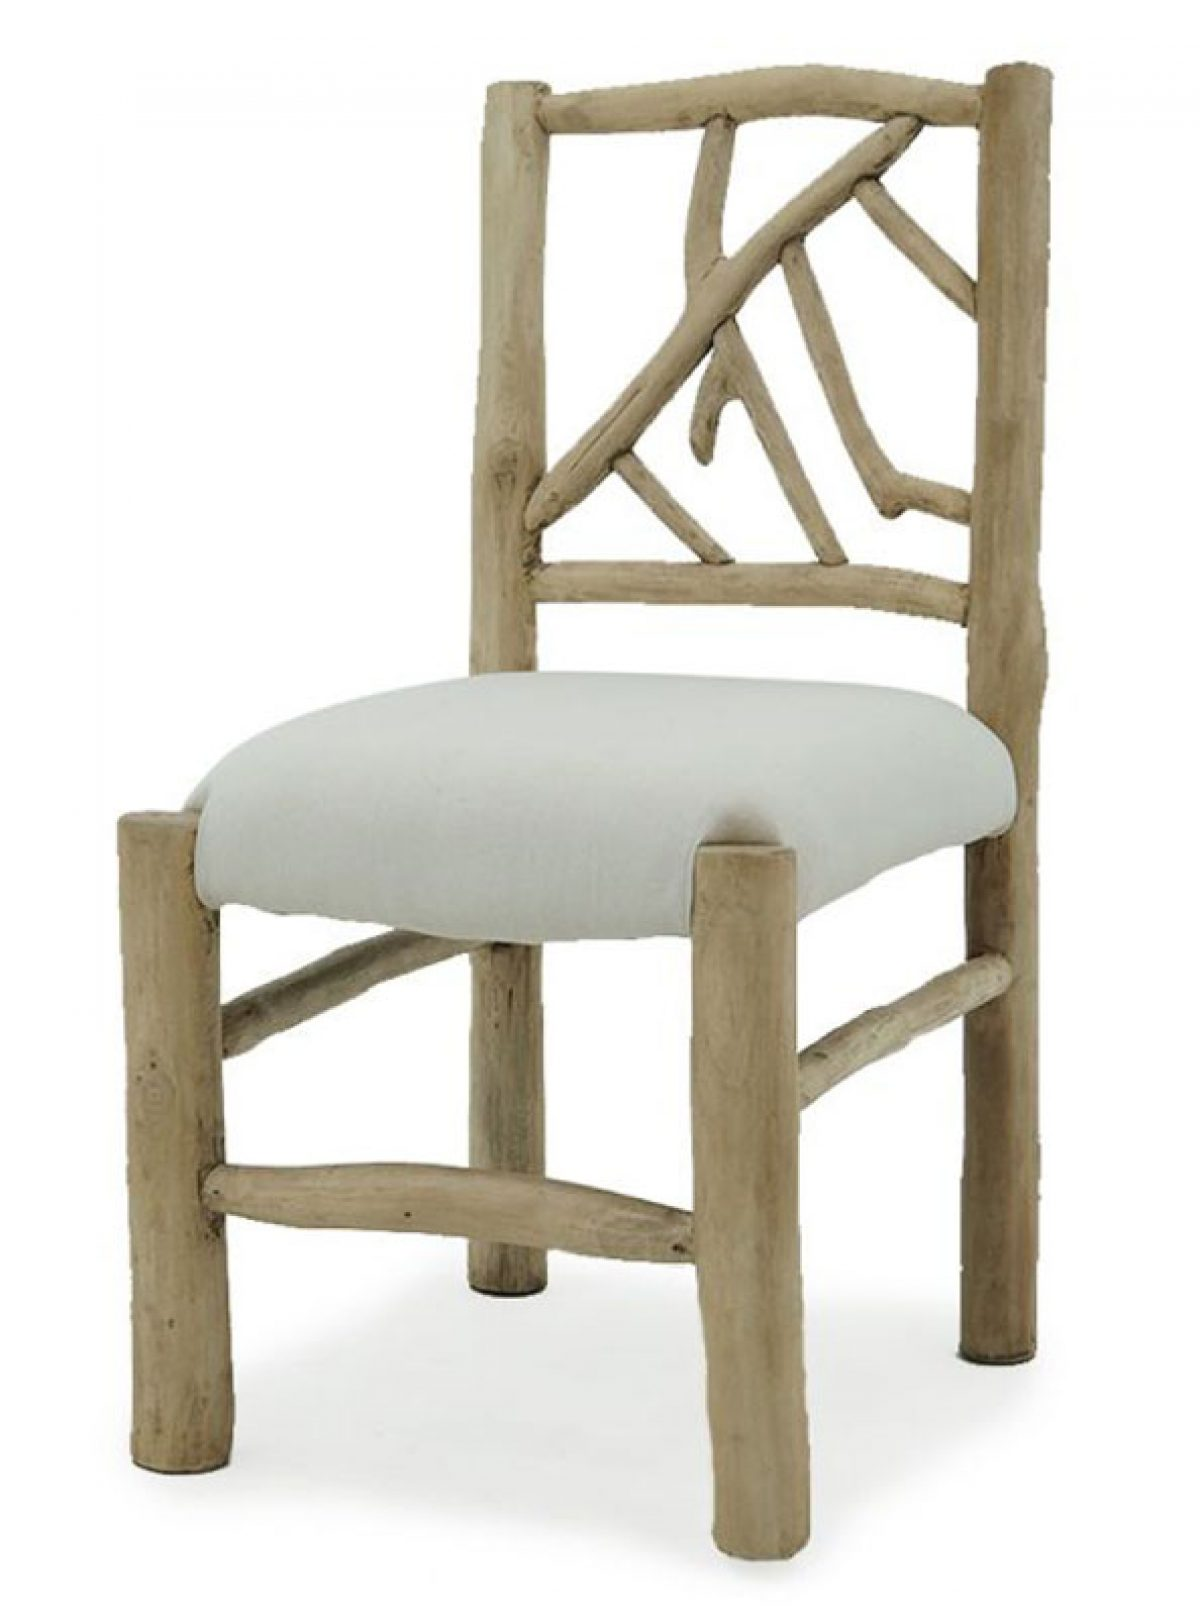 Jakarta Chair Teak Branch Furniture Jepara Indonesia Teak Wood